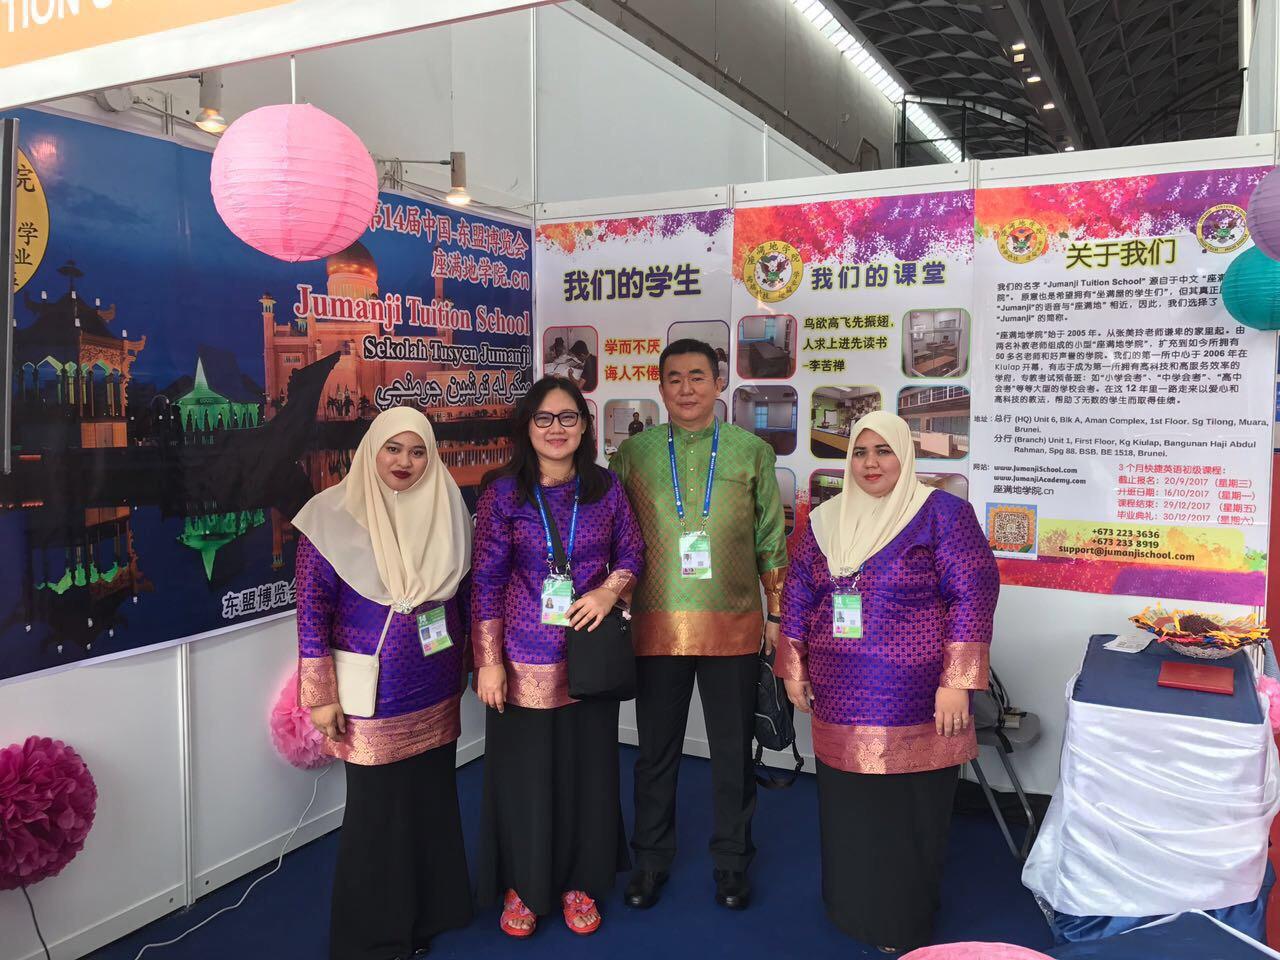 Jumanji Tuition School in CAEXPO 2017 in Nan Ning China